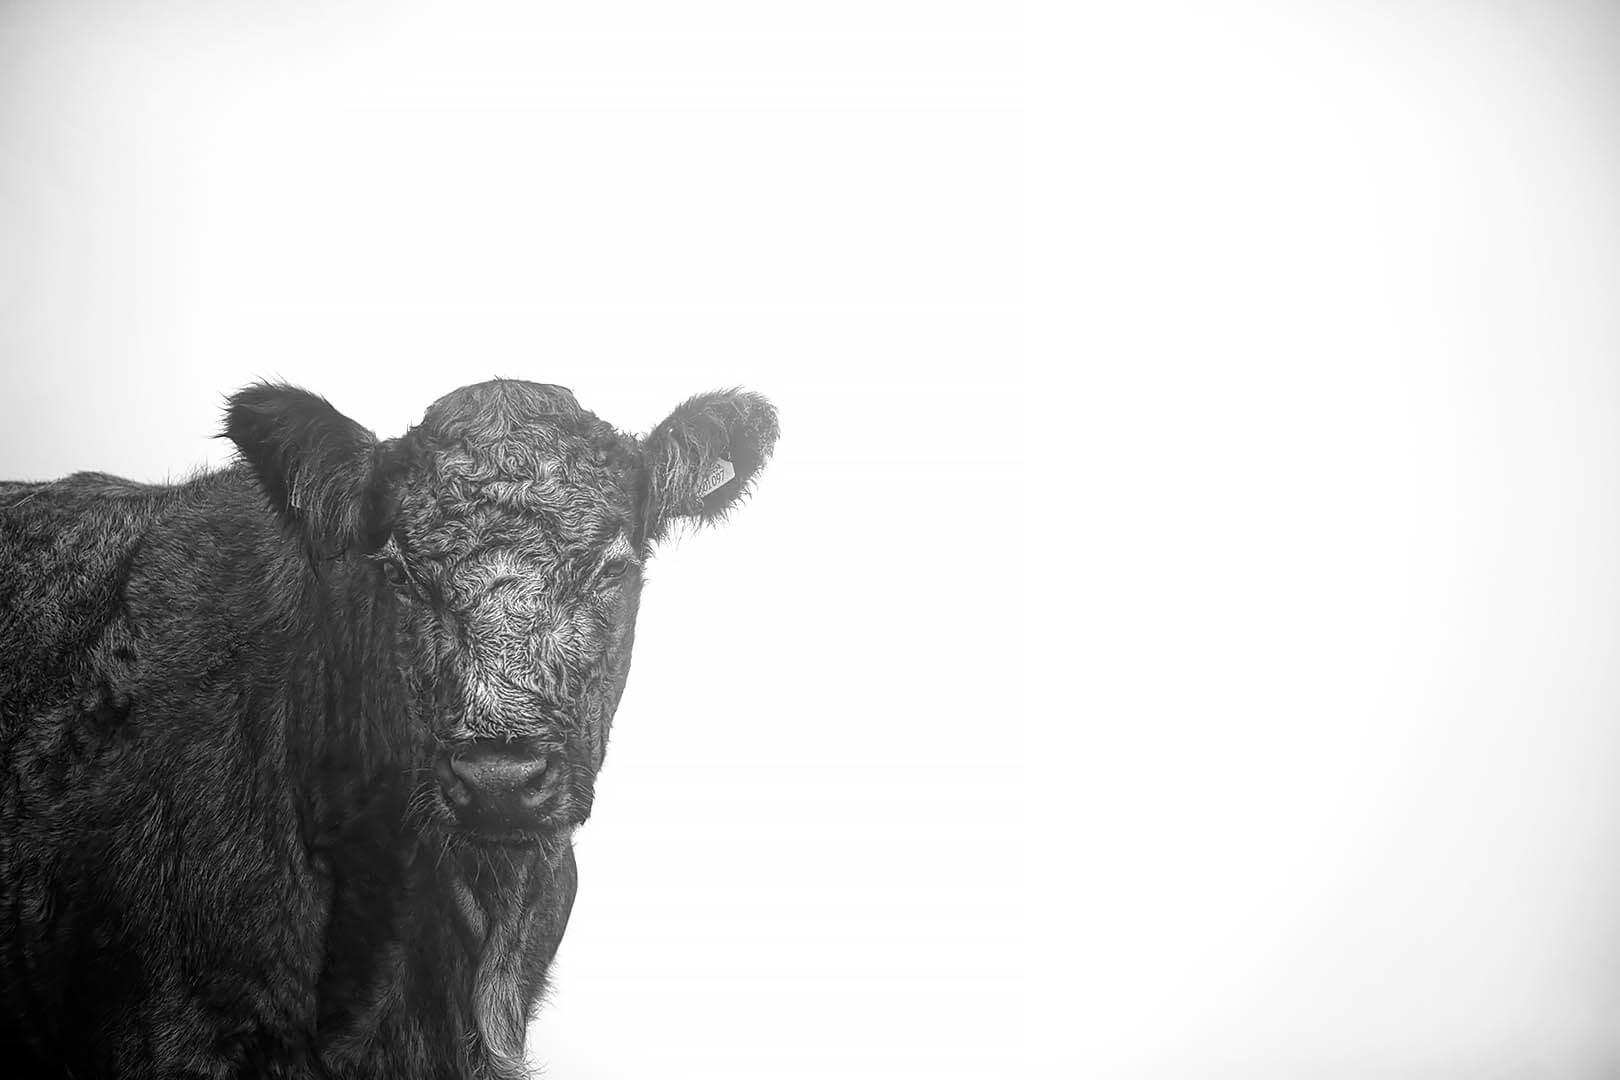 Cow In Fog